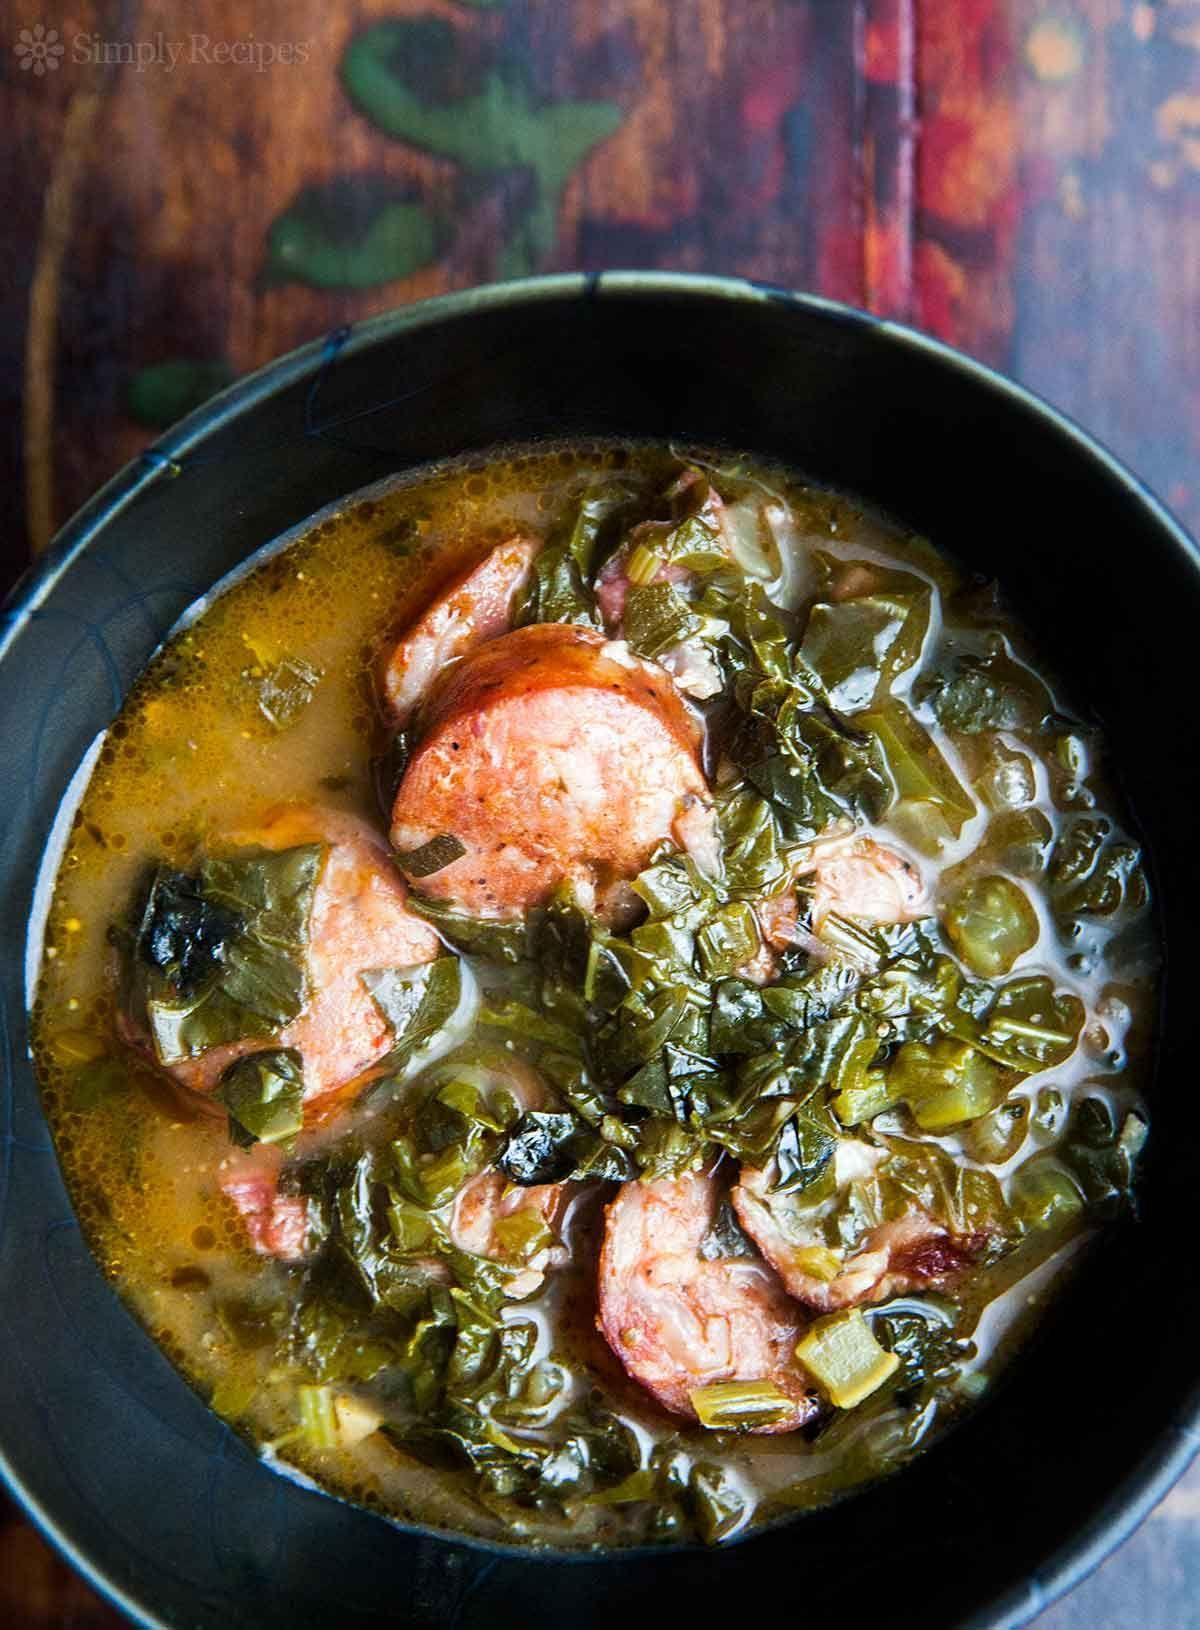 Sausage & Turnips | Recipe | Thanksgiving side dishes ...  |Kale Turnip Casserole